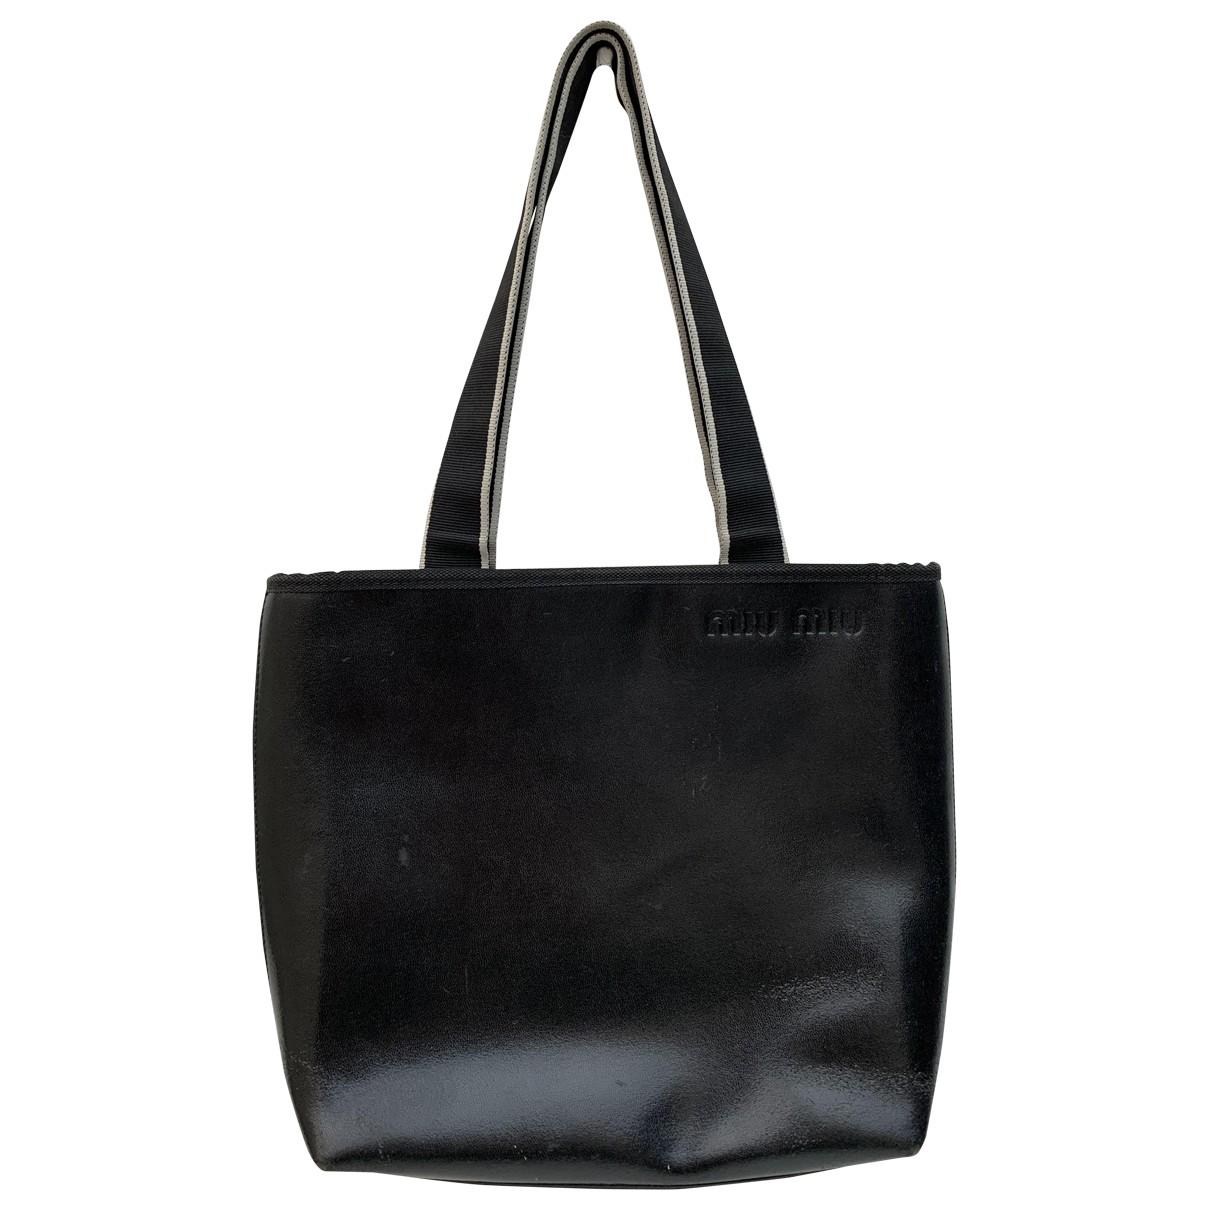 Miu Miu \N Handtasche in  Schwarz Leder